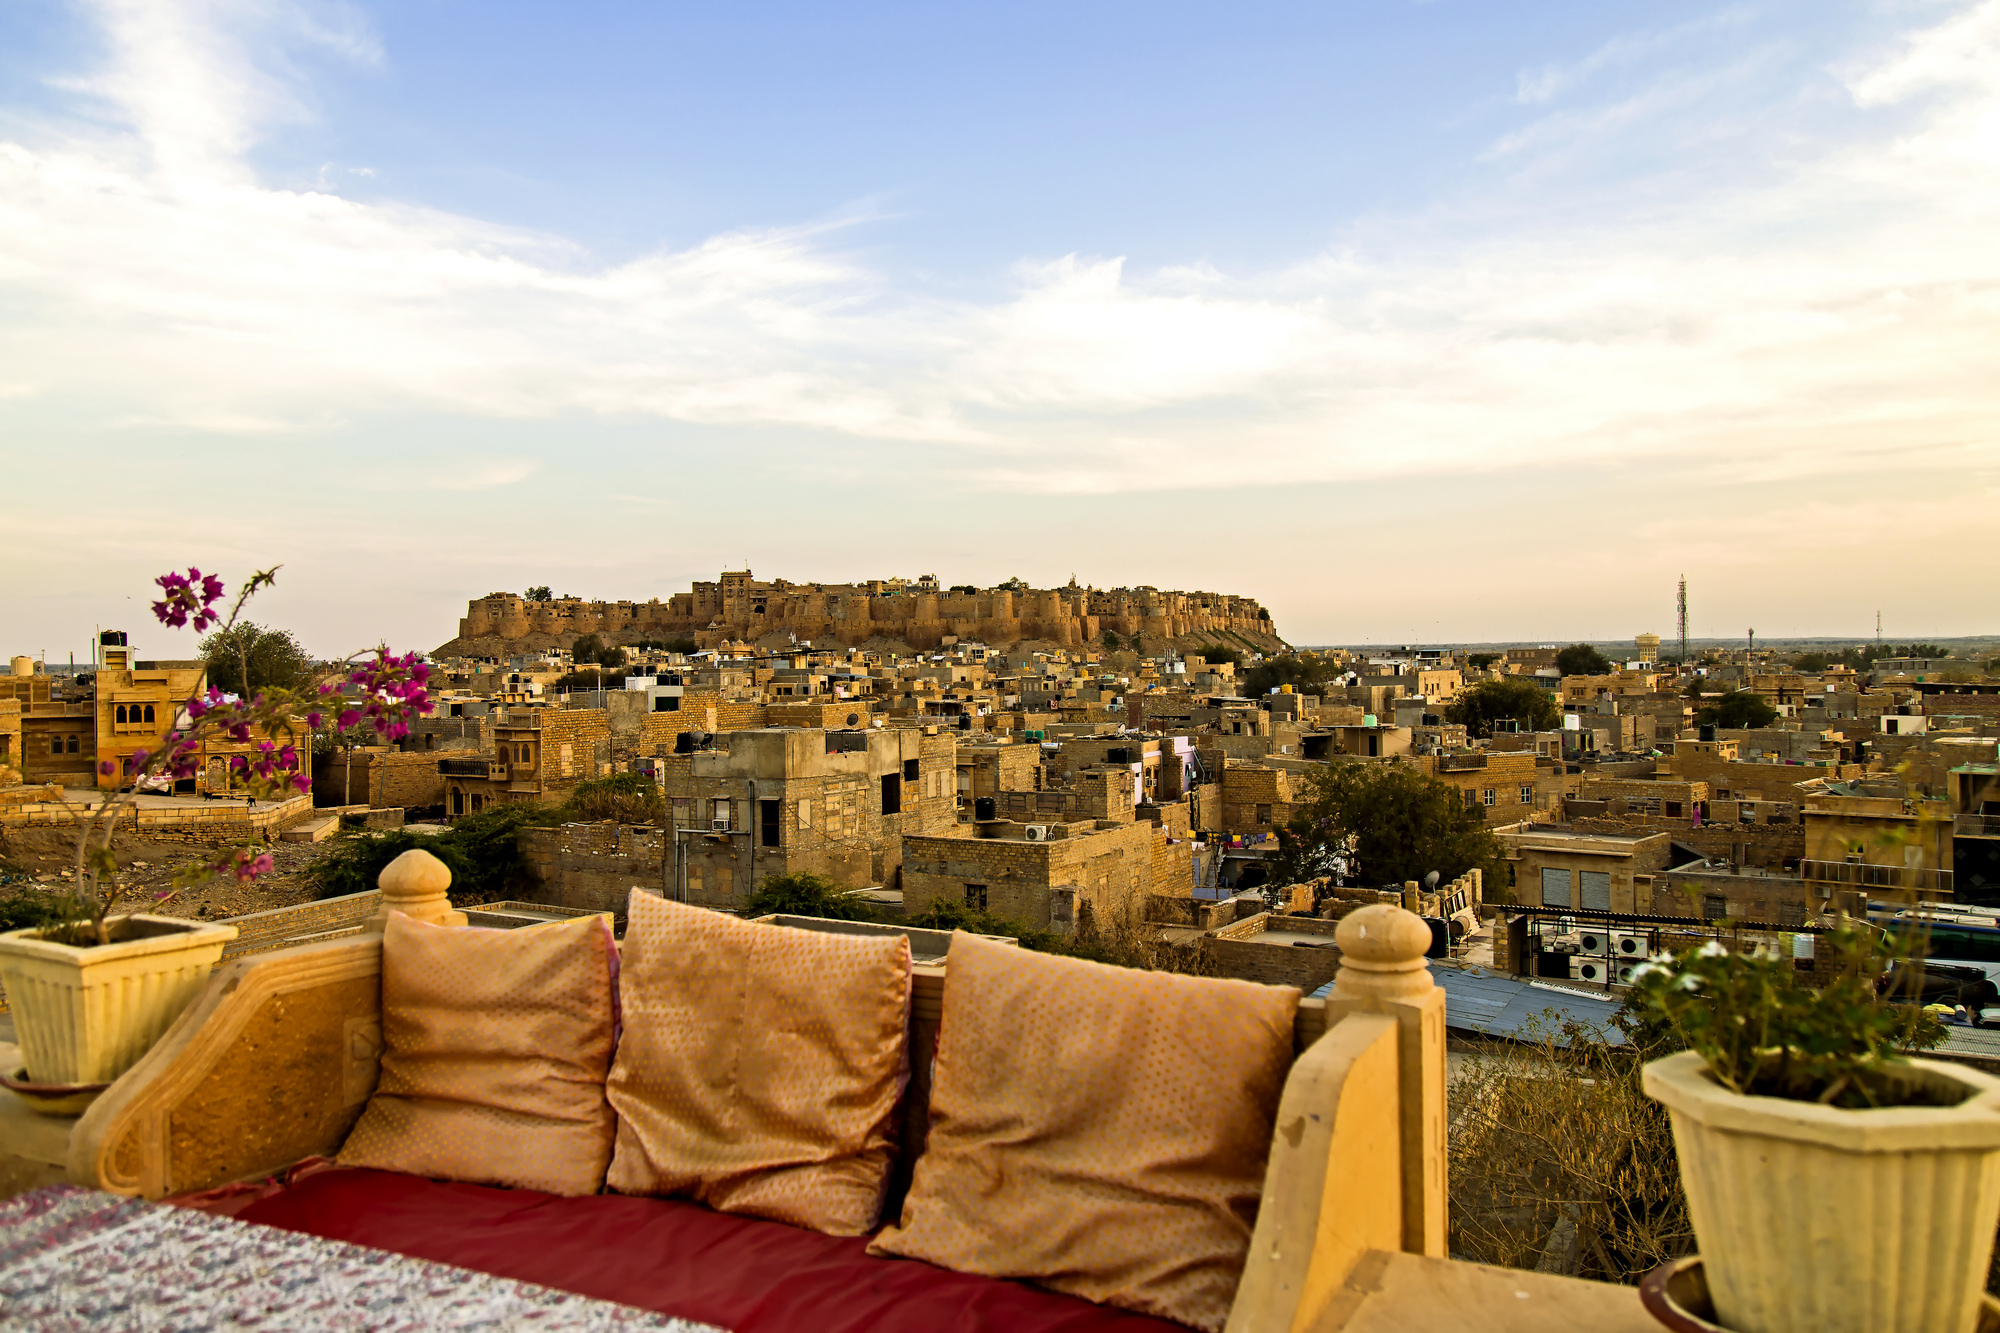 The Golden Fort at Jaisalmer, Rajasthan